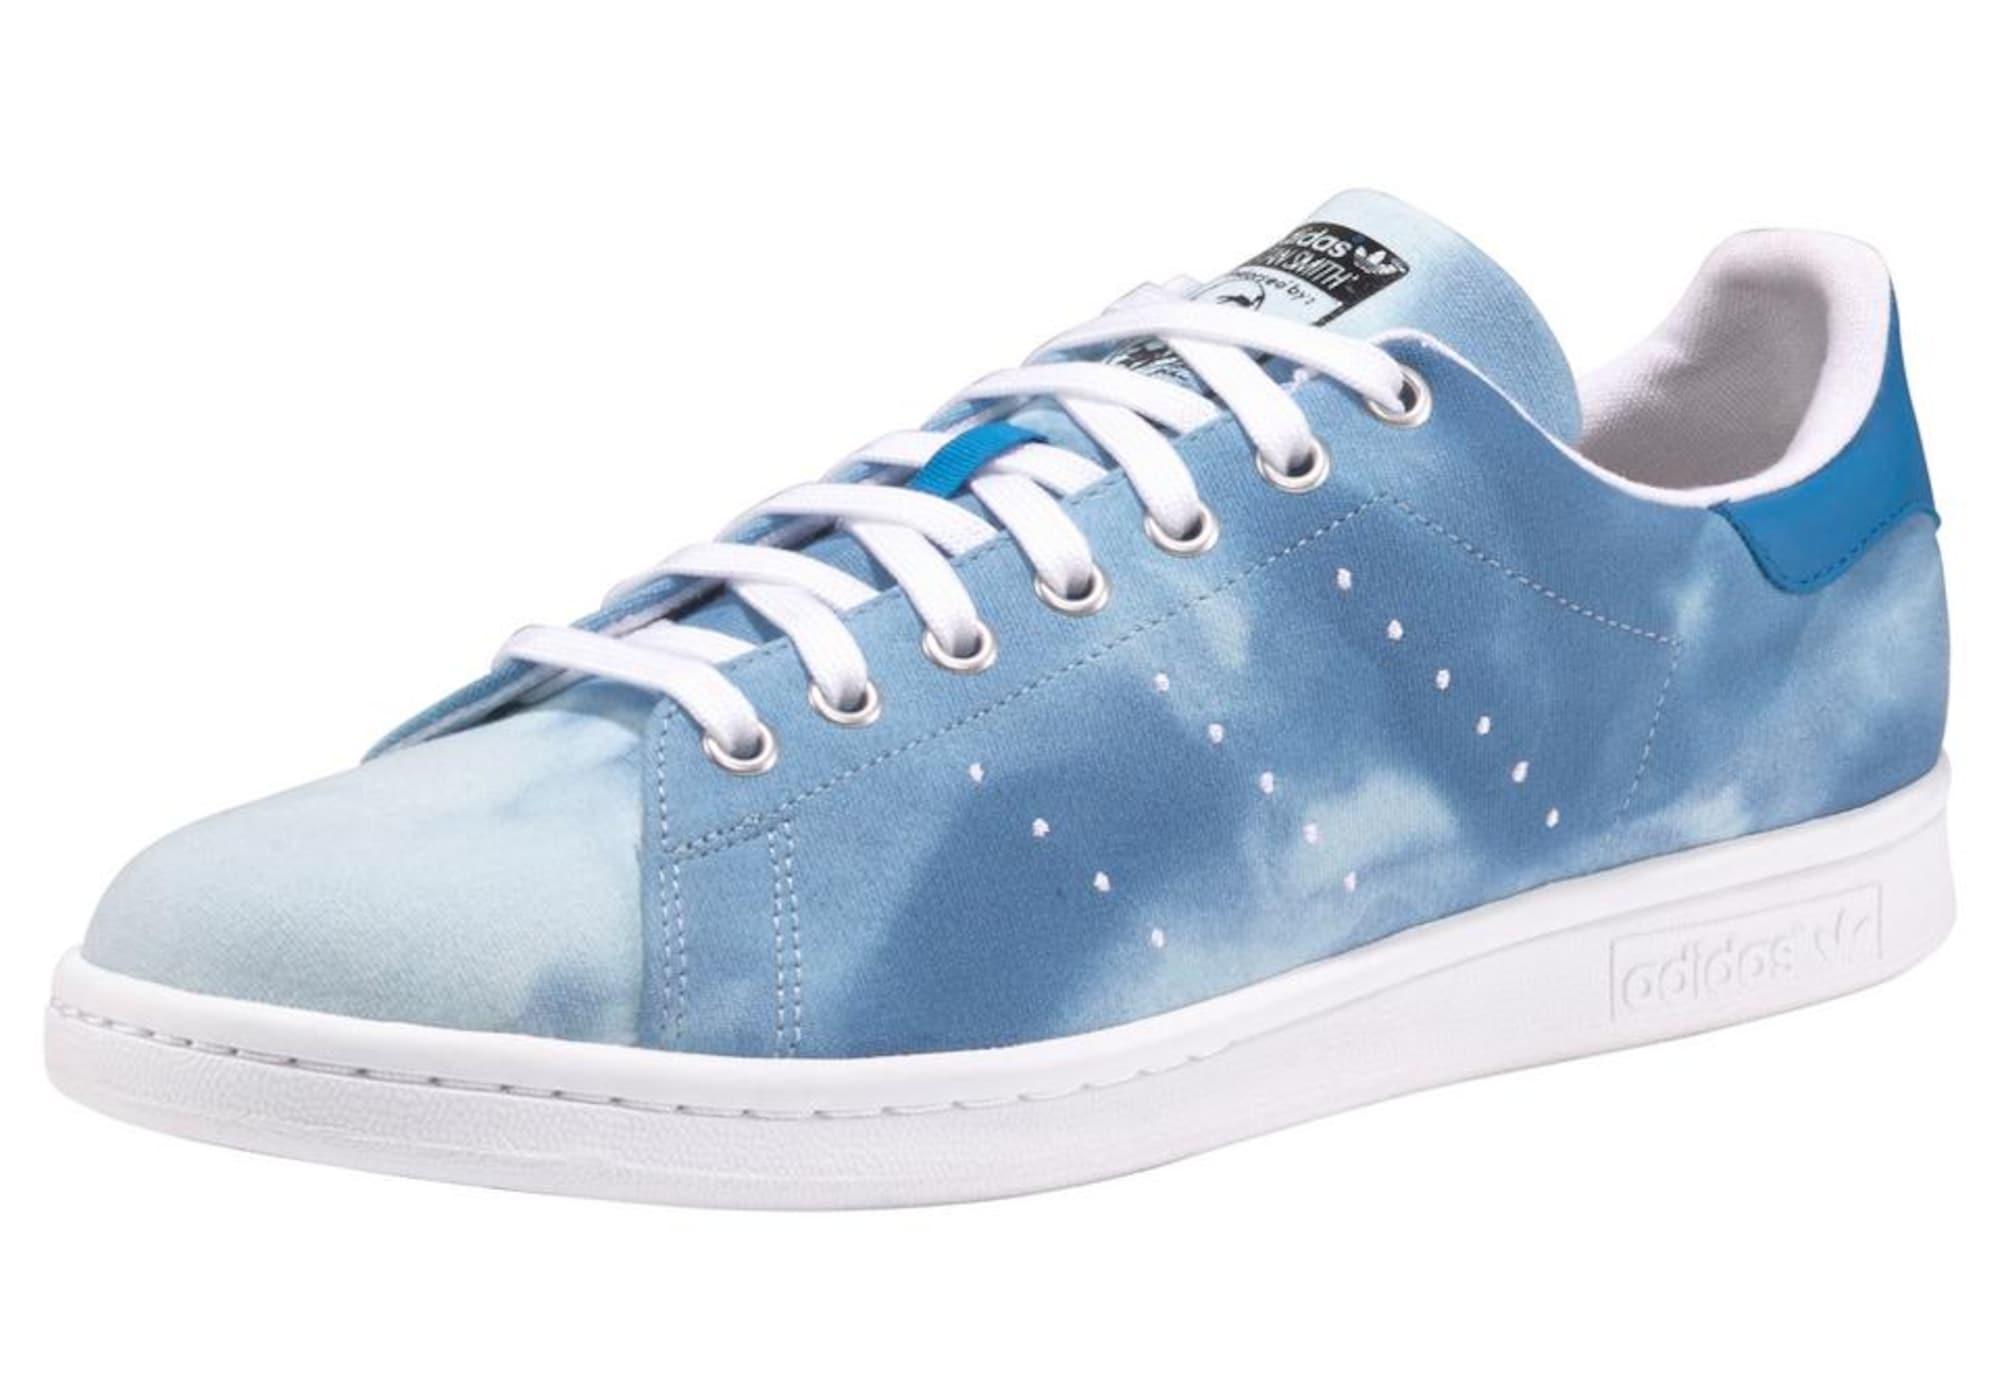 AboutYou | SALE Herren ADIDAS ORIGINALS Sneaker 'PW HU Holi